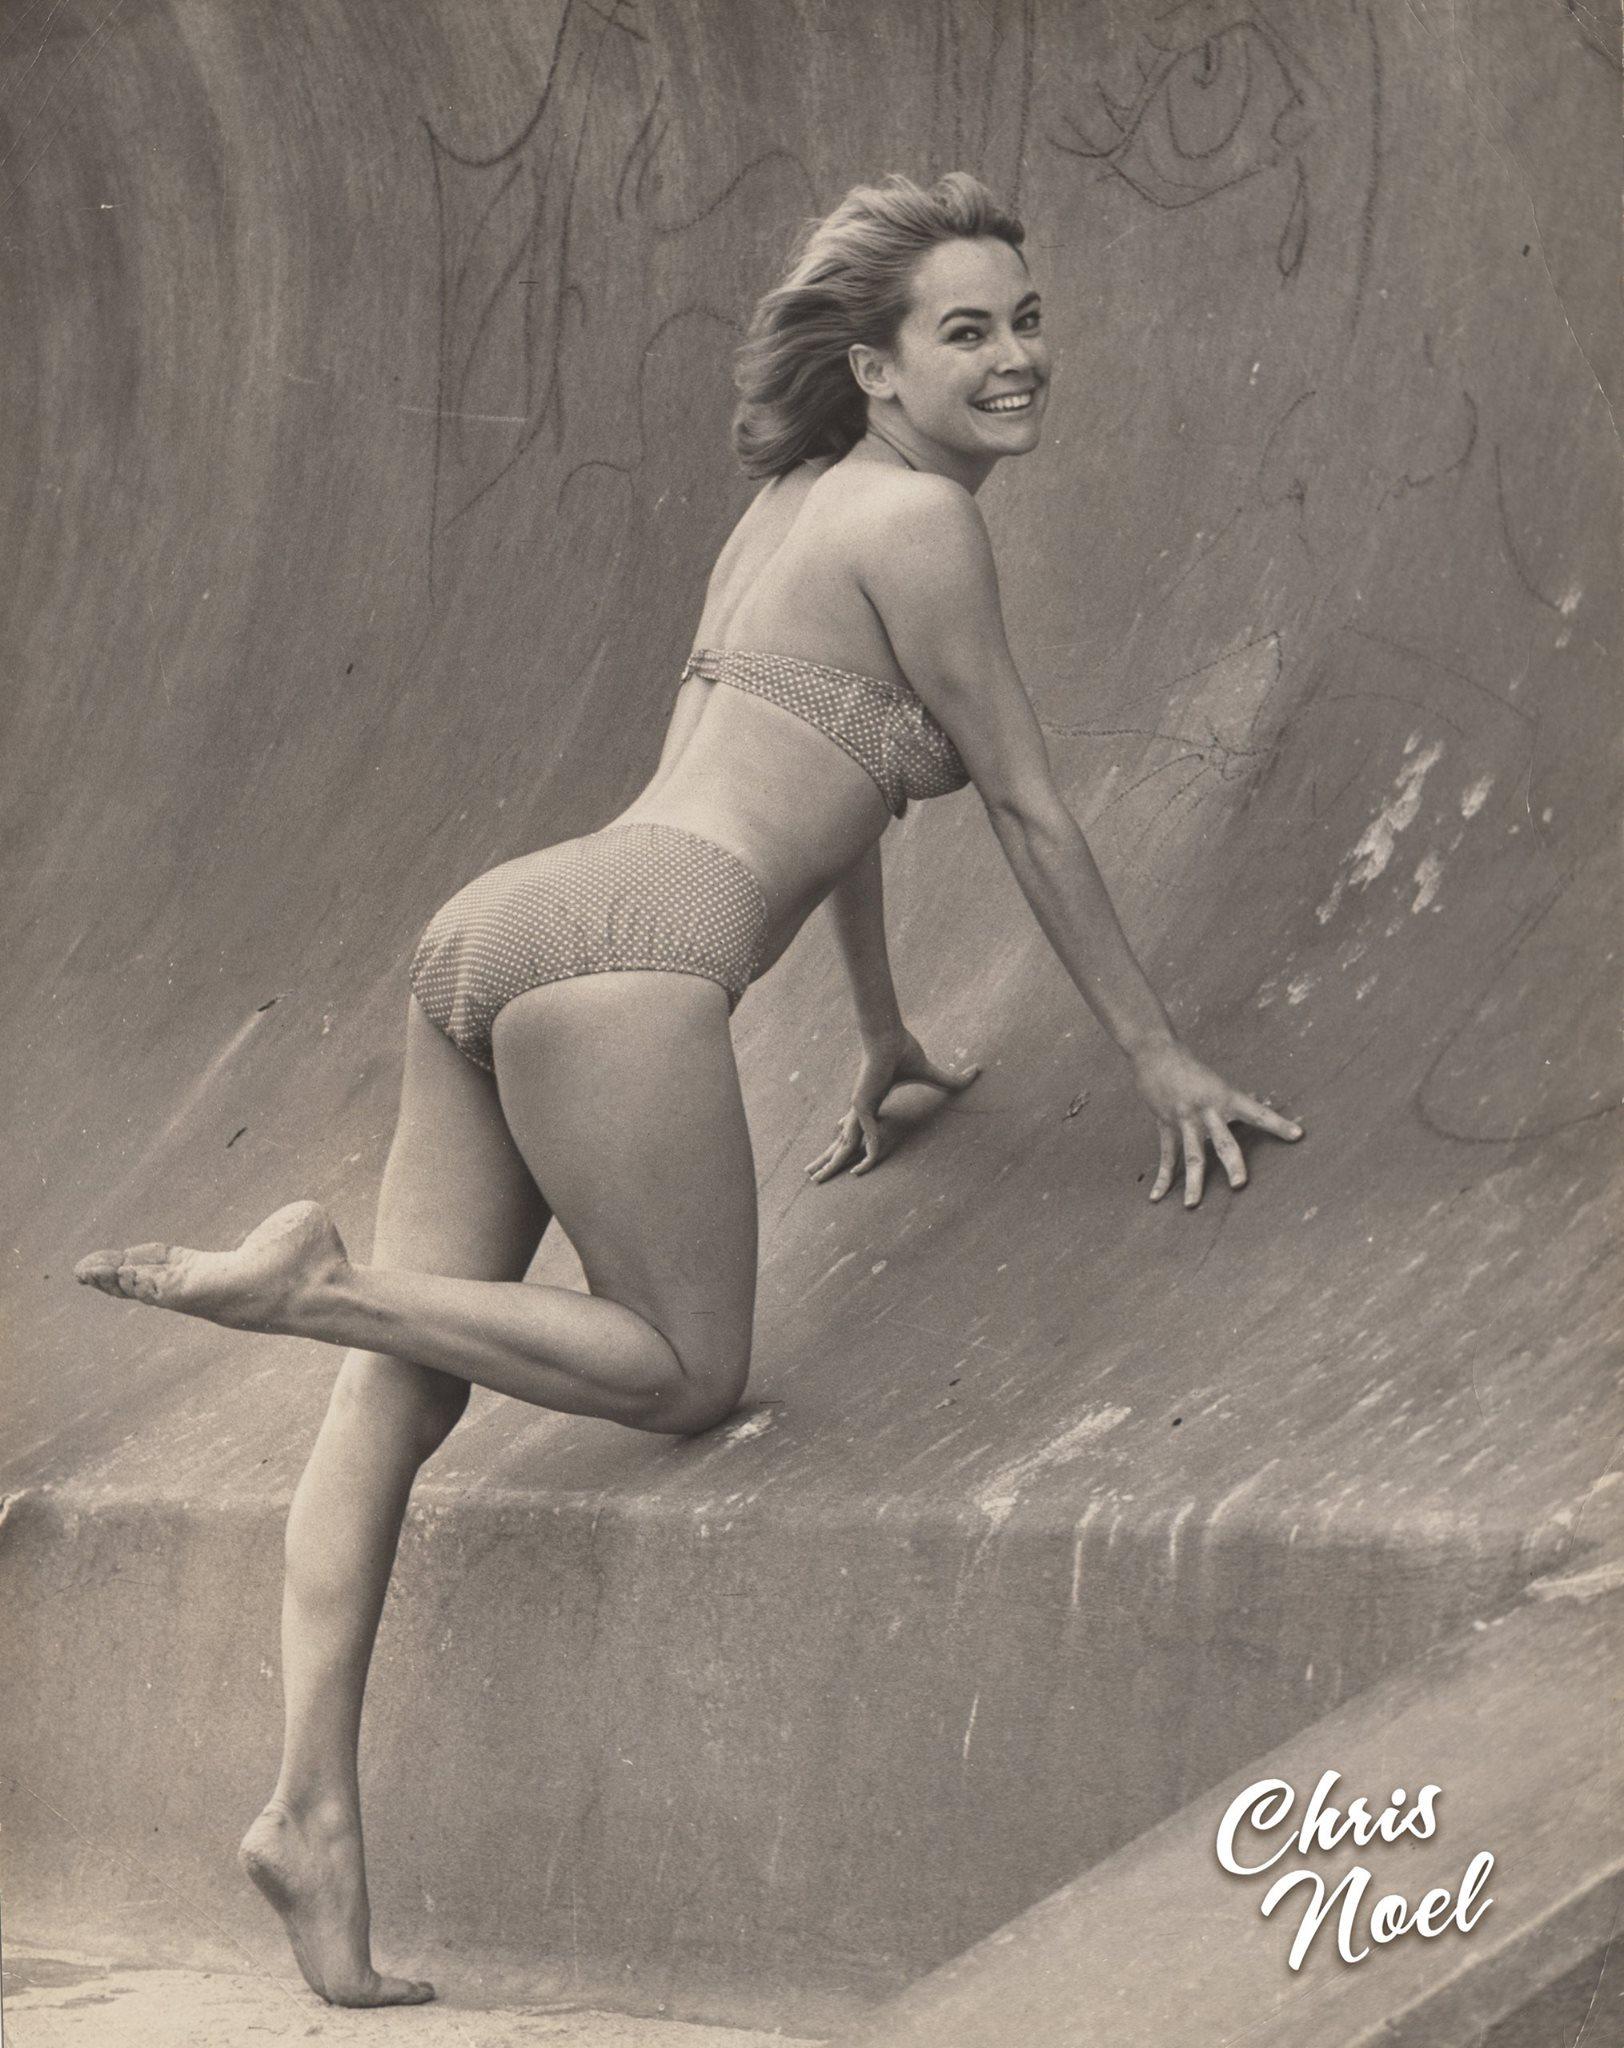 Johanna Baer,Caroline Goodall XXX nude Valerie Jean Garduno USA 1995,Betty White